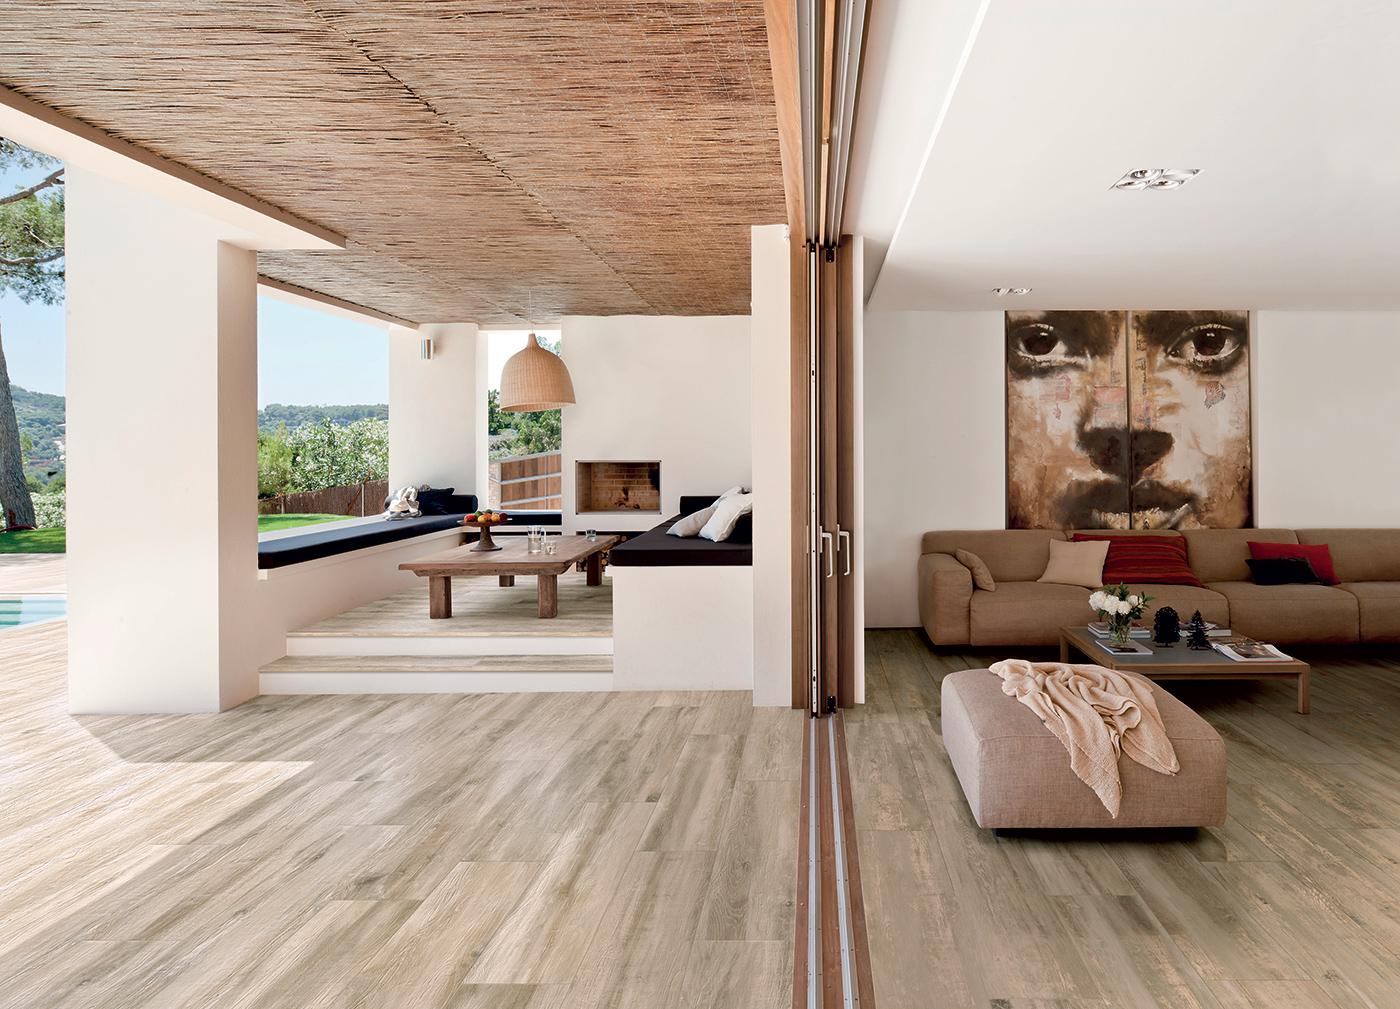 Dalle Ceramique Imitation Bois essenze (phorma) - sichenia - | floor tiles & wall tiles